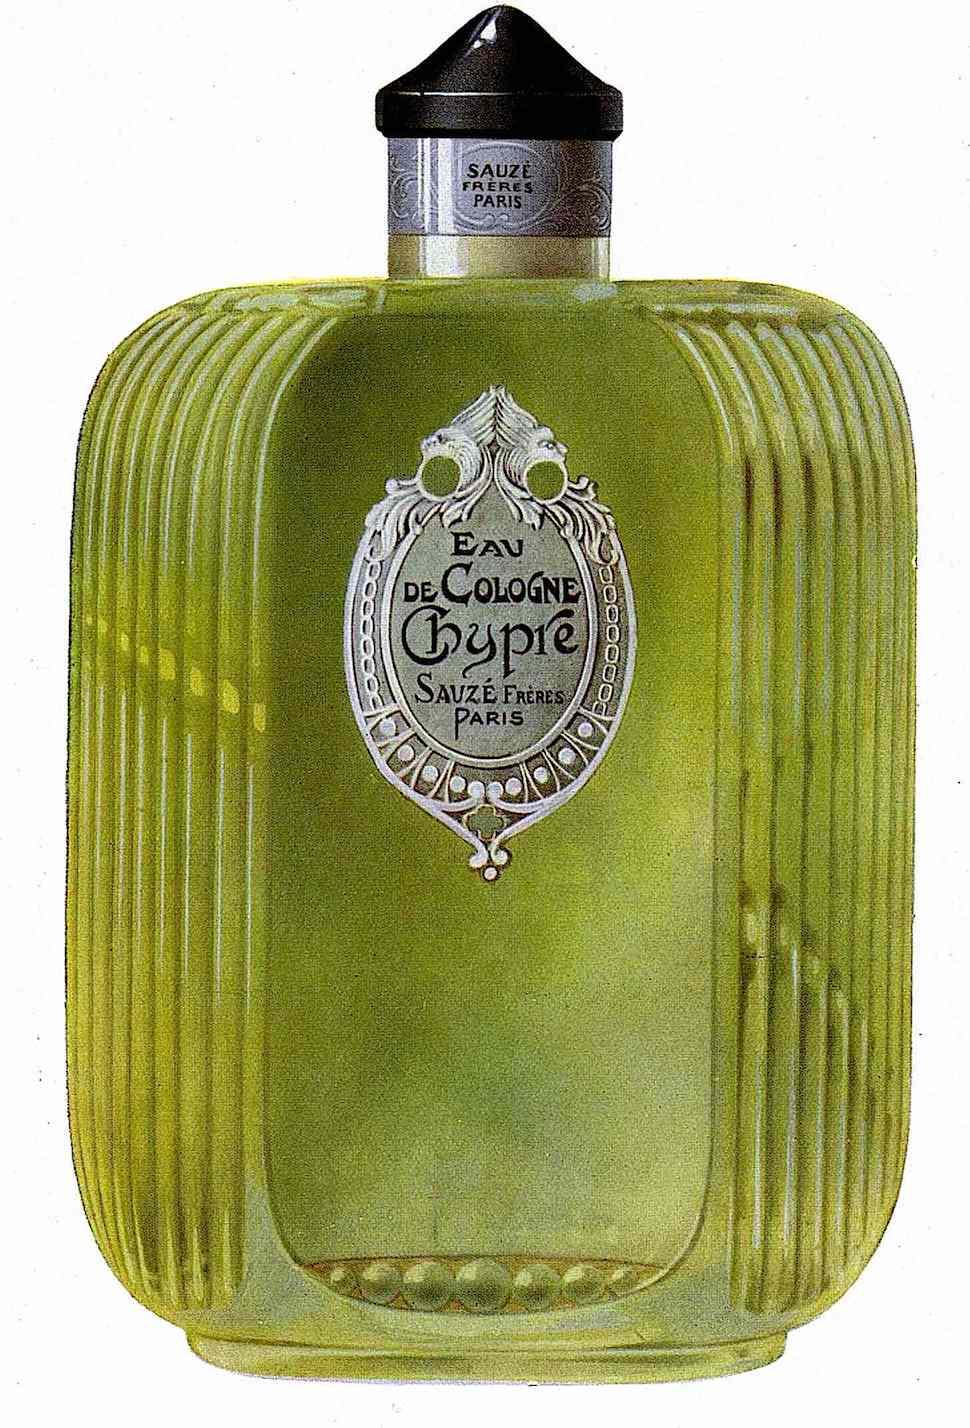 1925 perfume France, a green art deco or moderne bottle